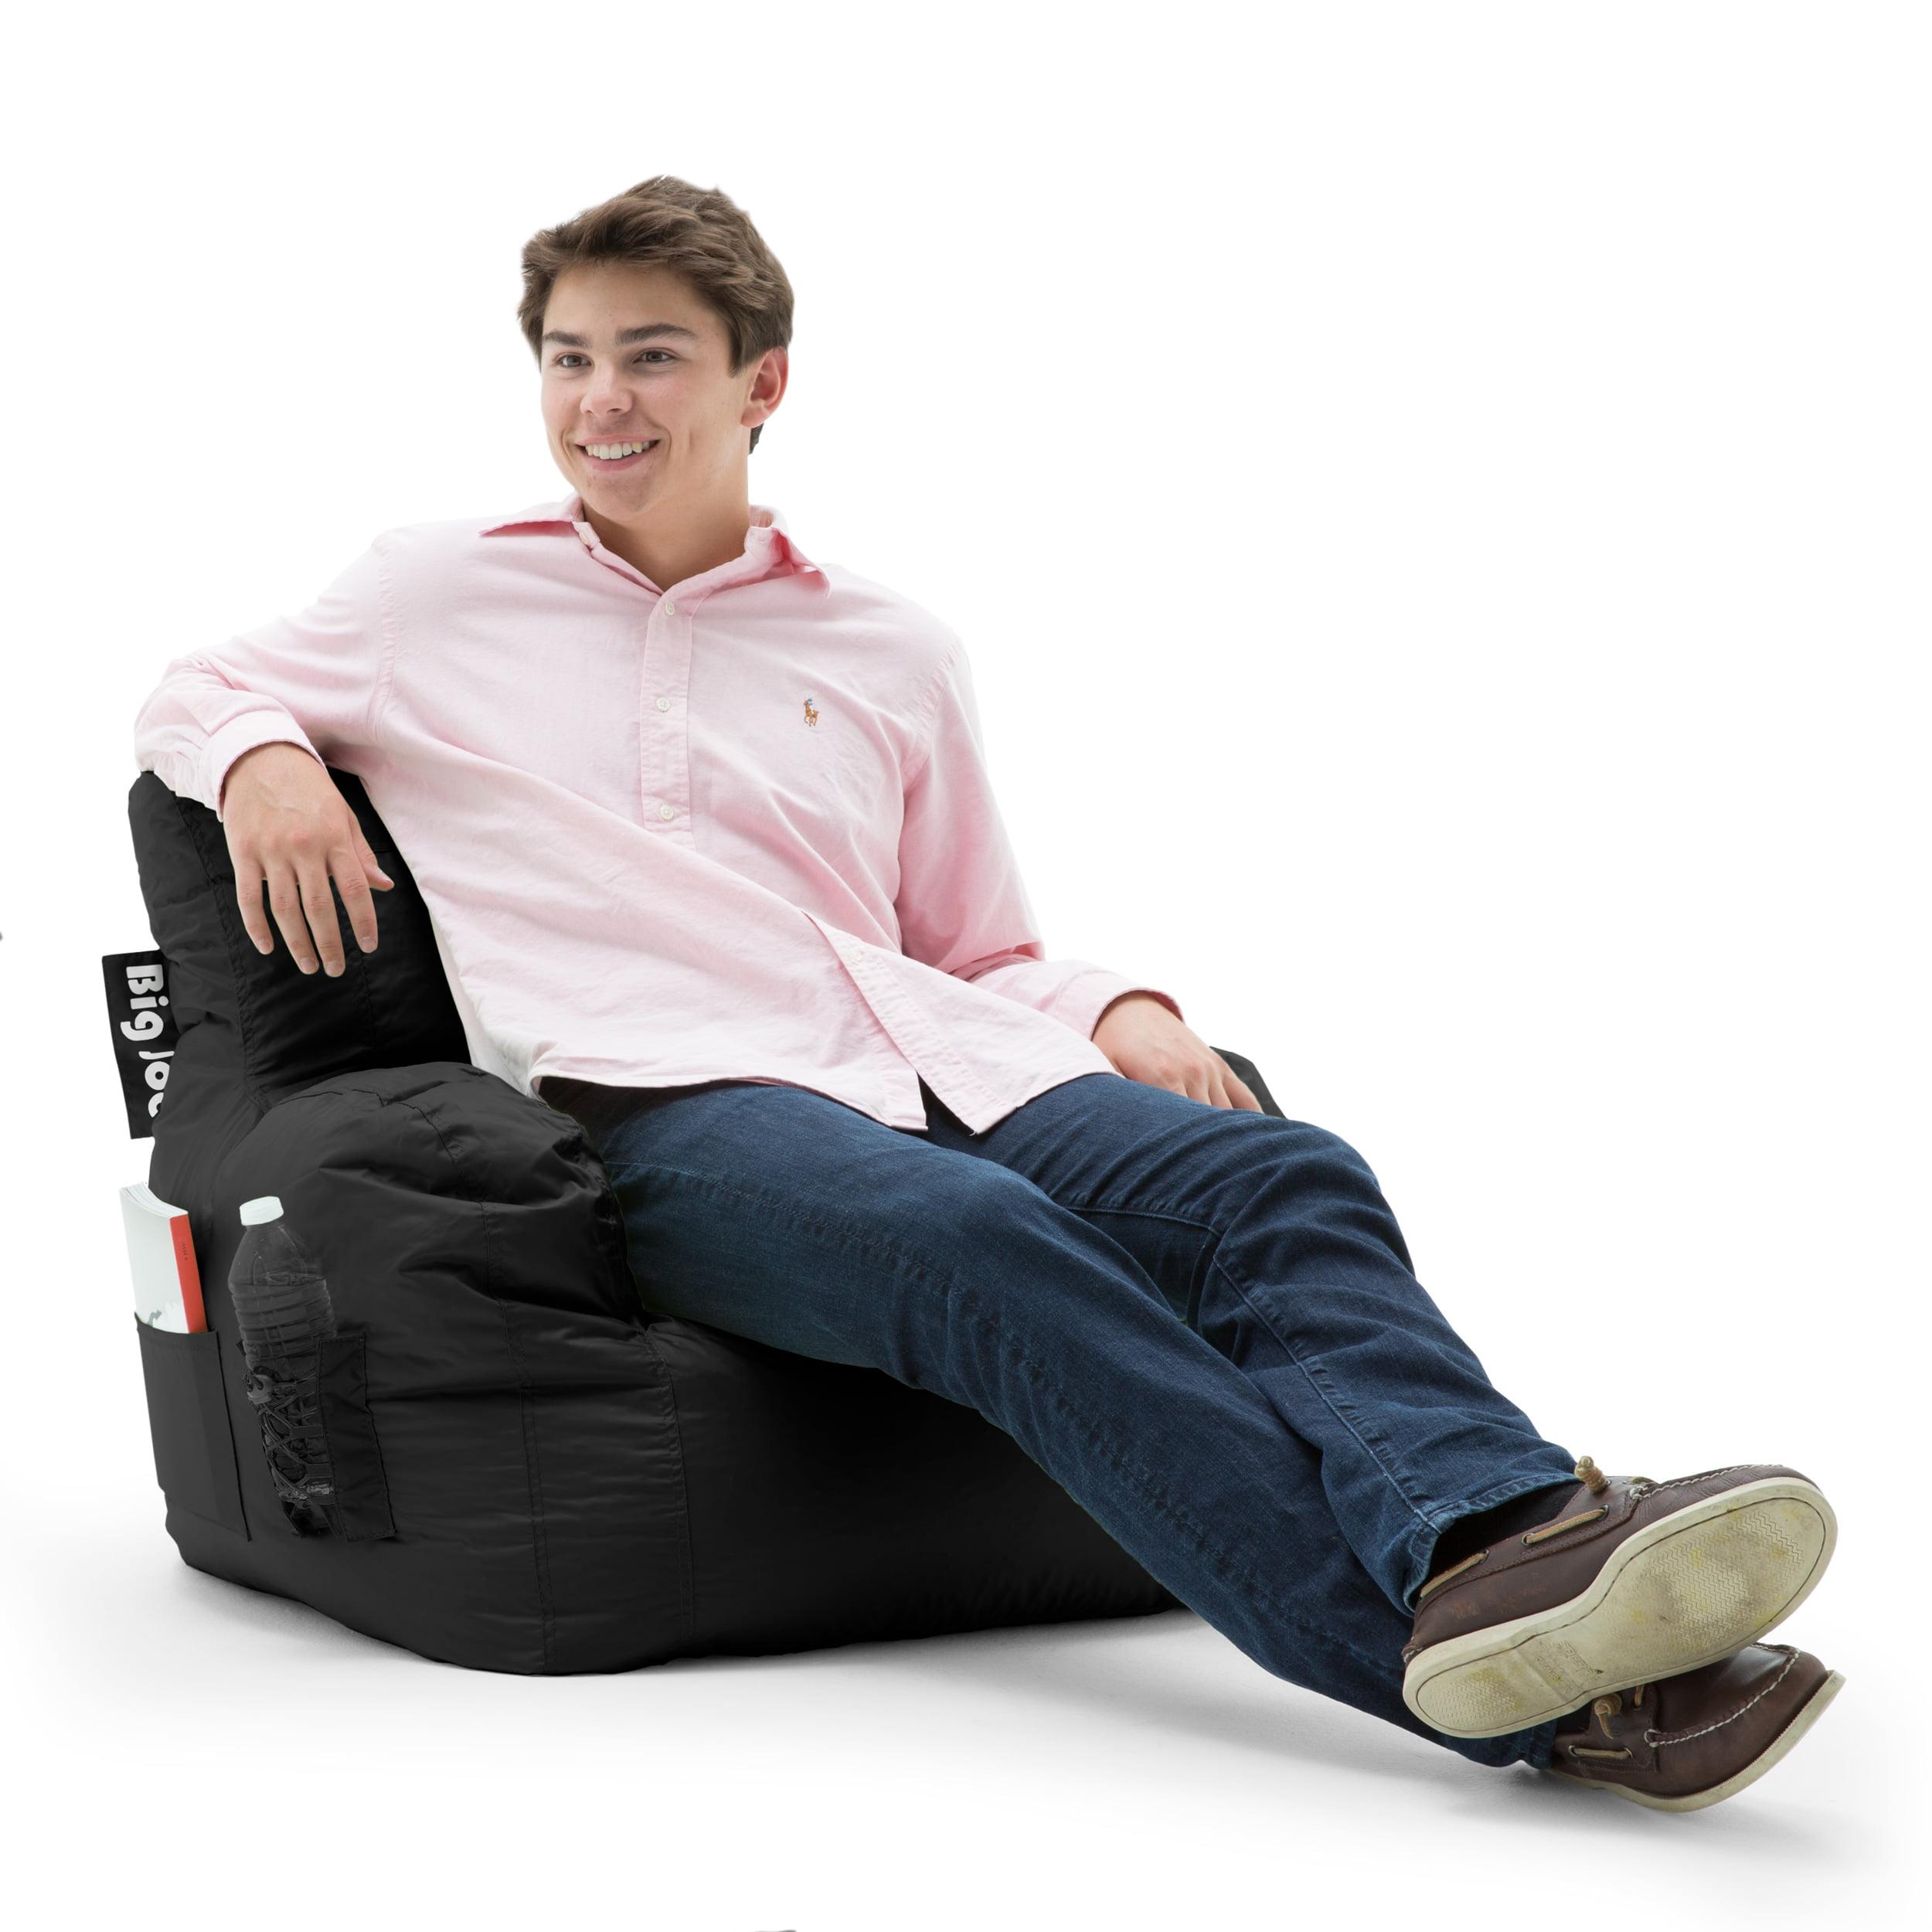 Big Joe Dorm Beanbag Chair by Comfort Research